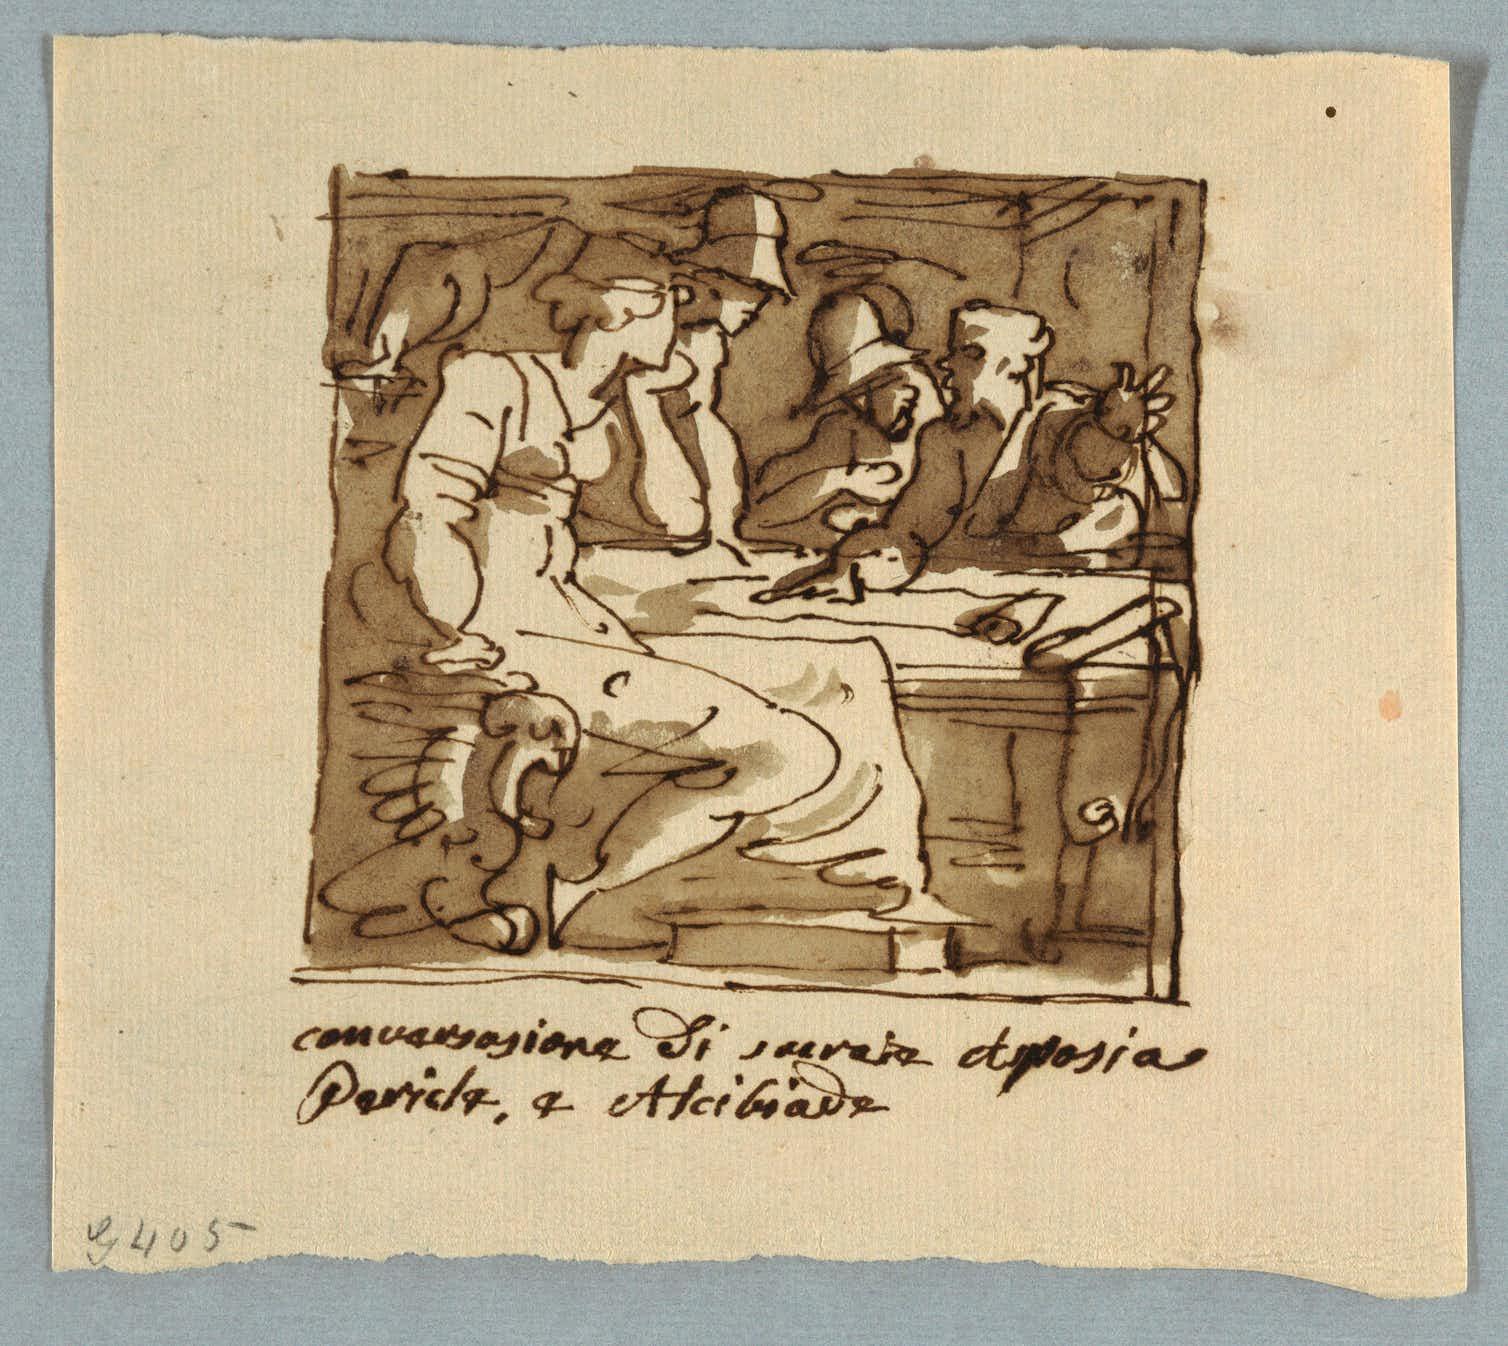 Socrates, Pericles, Alcibiades, Aspasia in Discussion, unknown artist, 1810–25. Credit: Wikimedia Commons